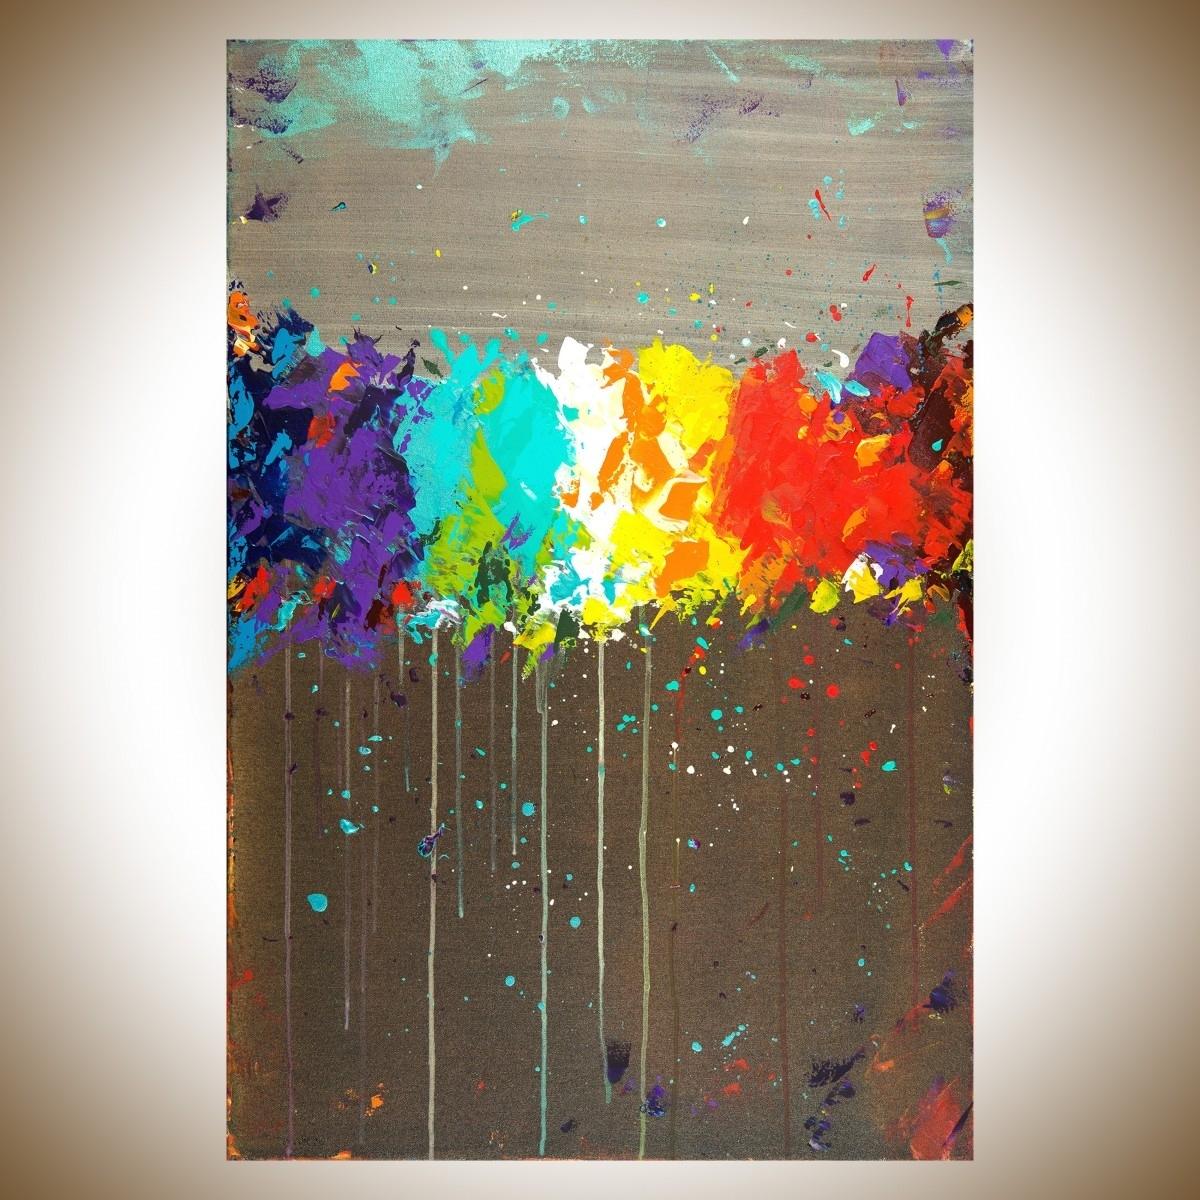 "Fireworksqiqigallery 36""x24"" Original Modern Abstract Wall Regarding 2017 Modern Abstract Wall Art (View 9 of 15)"